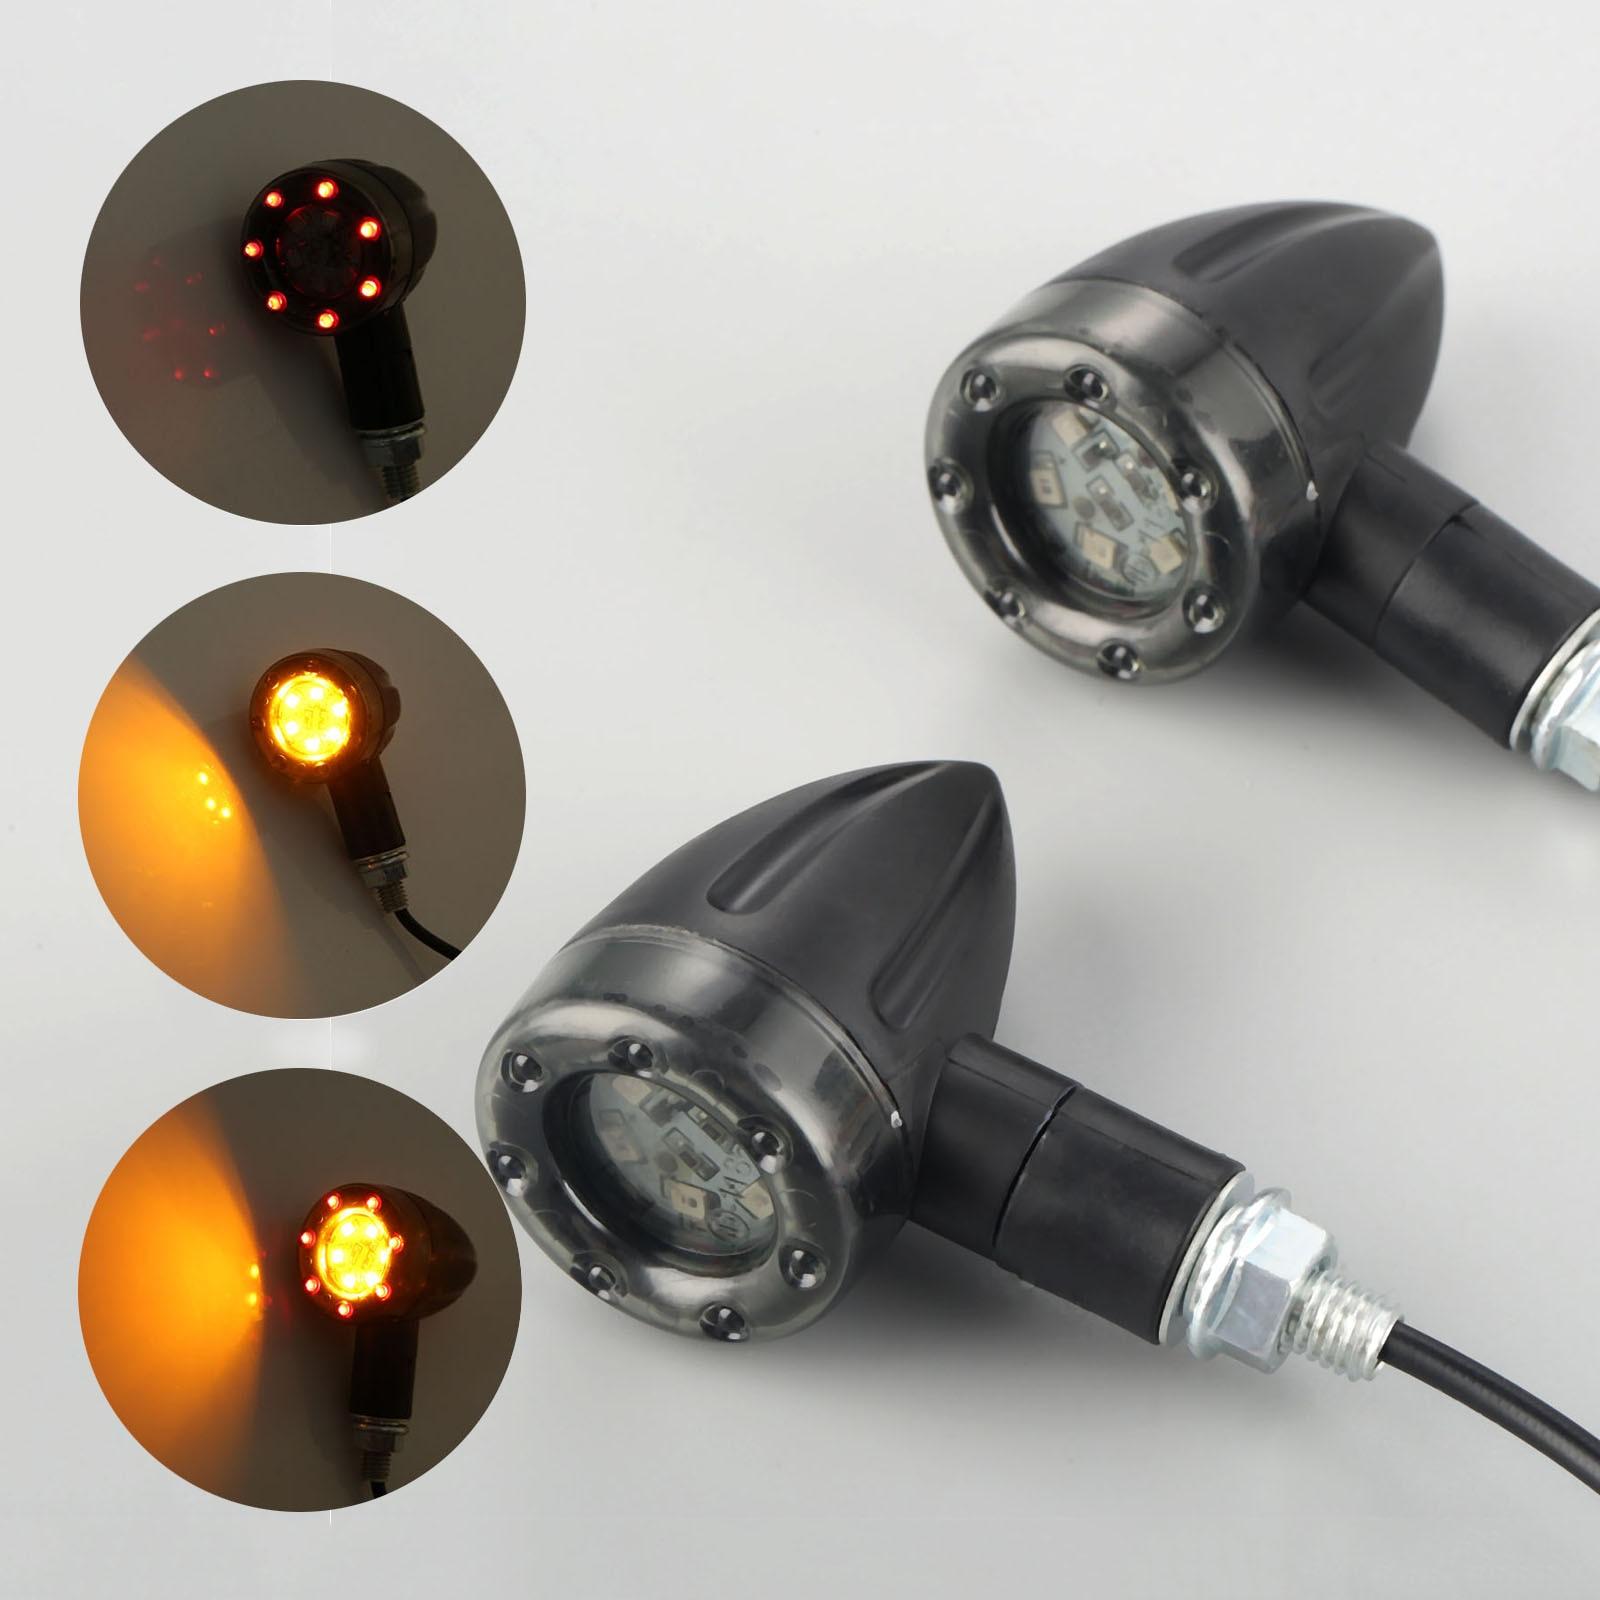 Mgoodoo 2Pcs/4Pcs Motorcycle LED Flasher Turn Signal Indicators light Brake Rear Running Lamp DC12V Amber LED Signal Turn Light